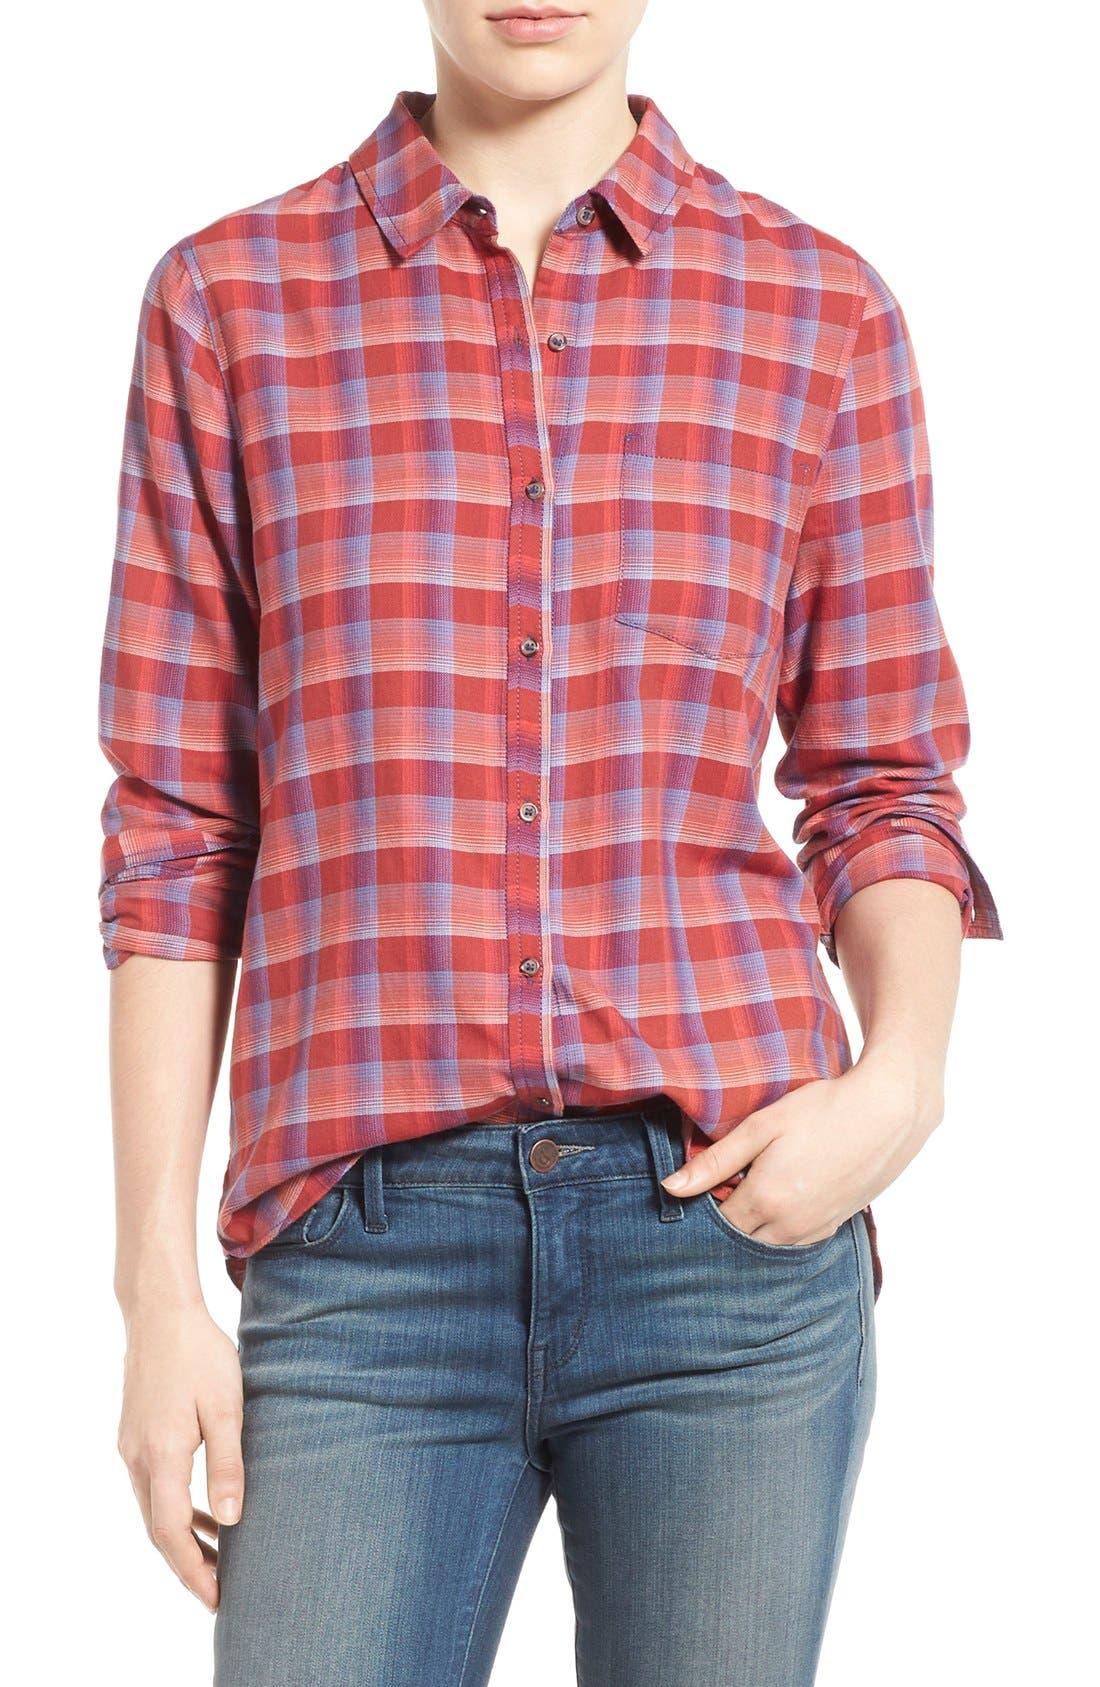 Main Image - Treasure&Bond Cotton Plaid Shirt